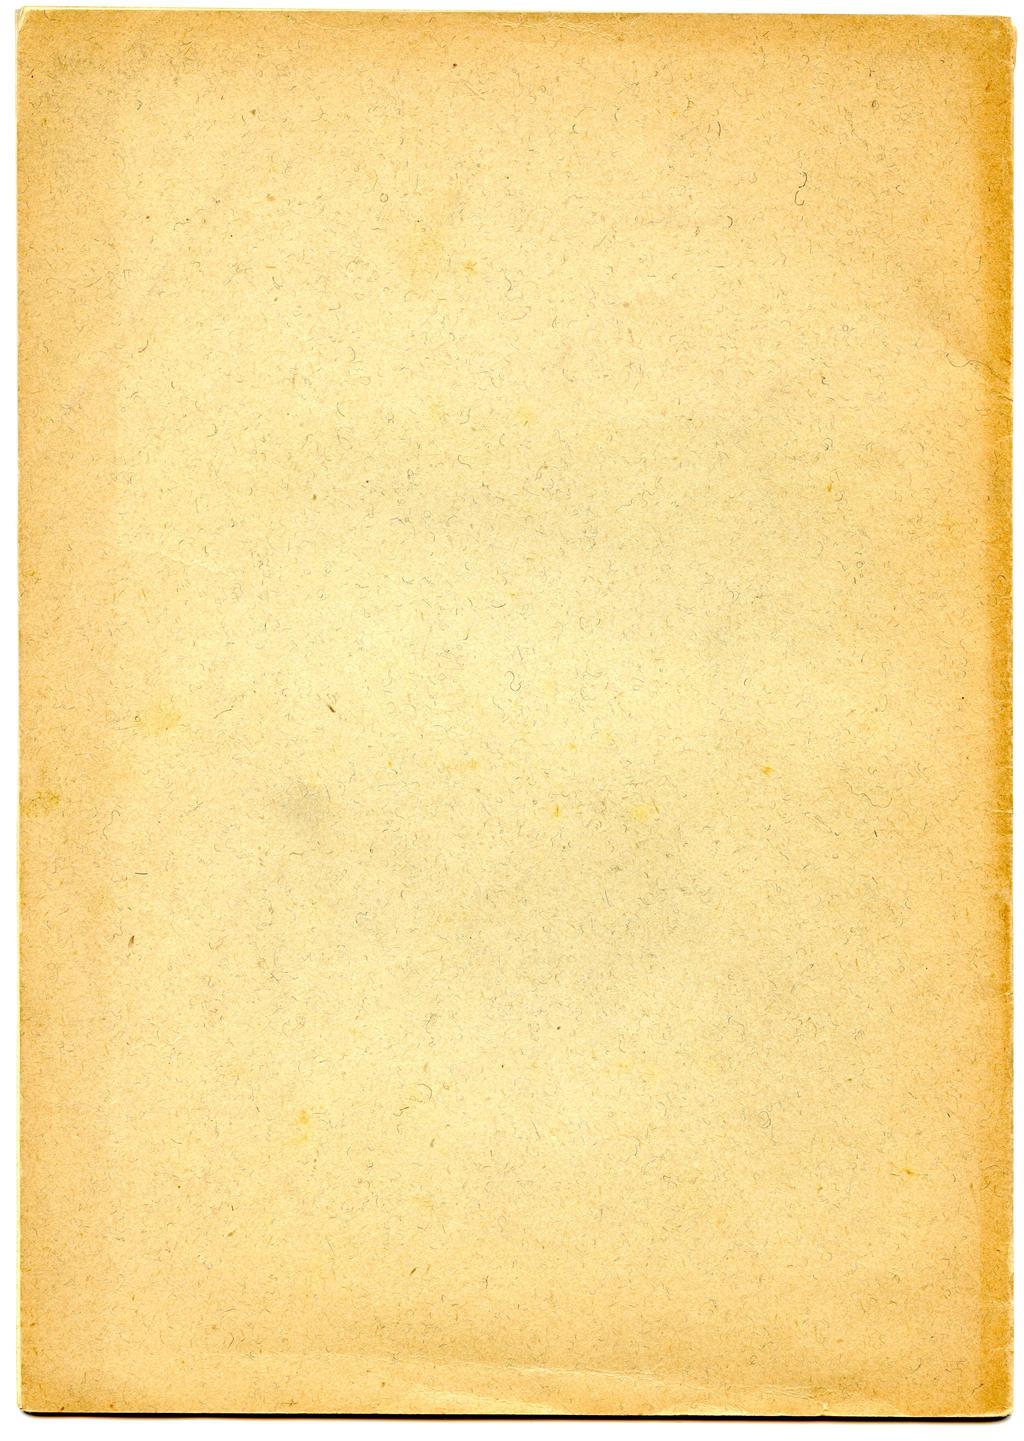 Paper texture 041